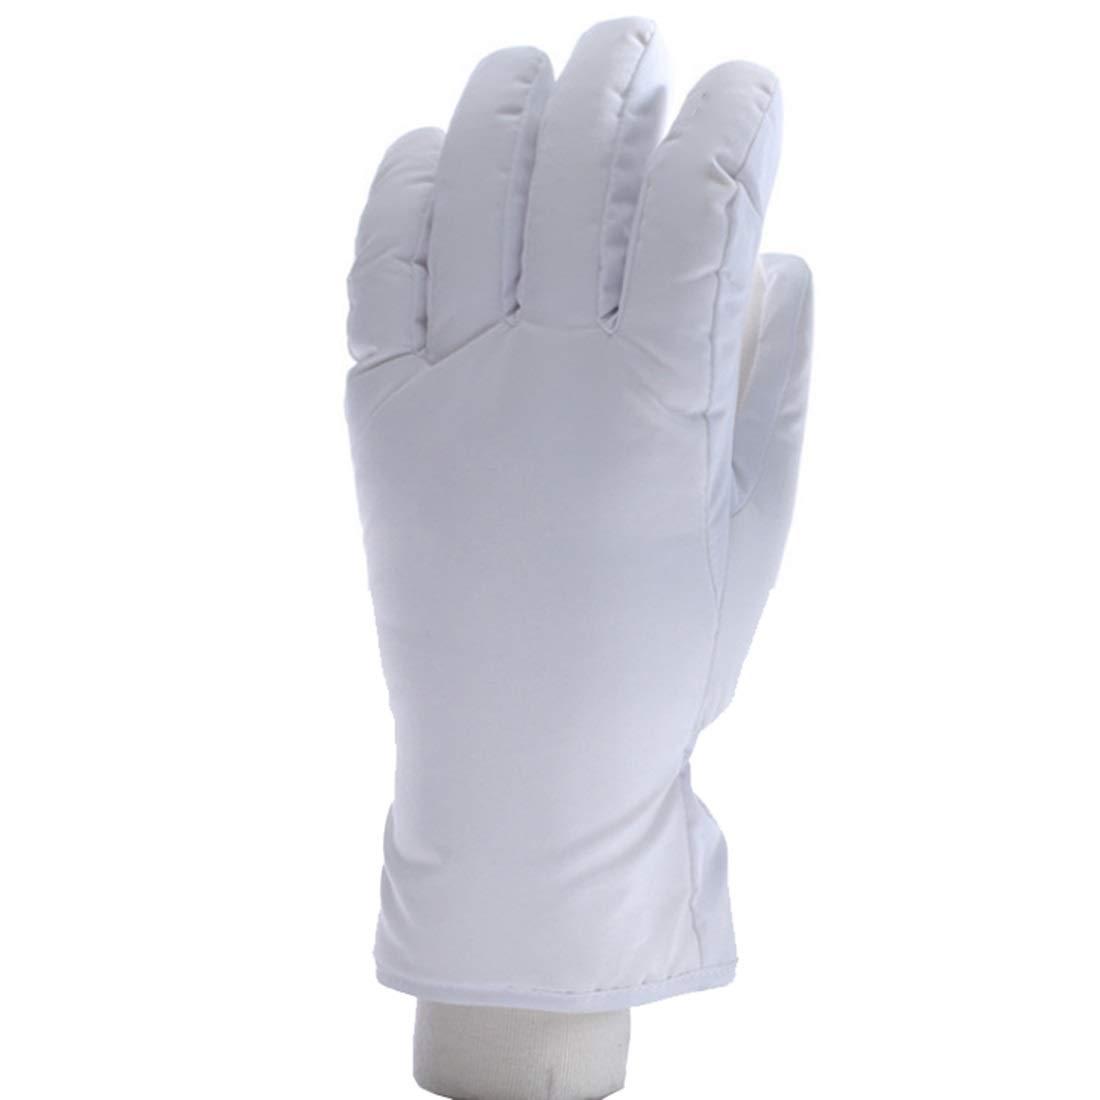 KERVINZHANG Guanti da Sci Invernali Antivento Impermeabili Guanti Invernali Invernali più Velluto (Color : Black, Size : XL)